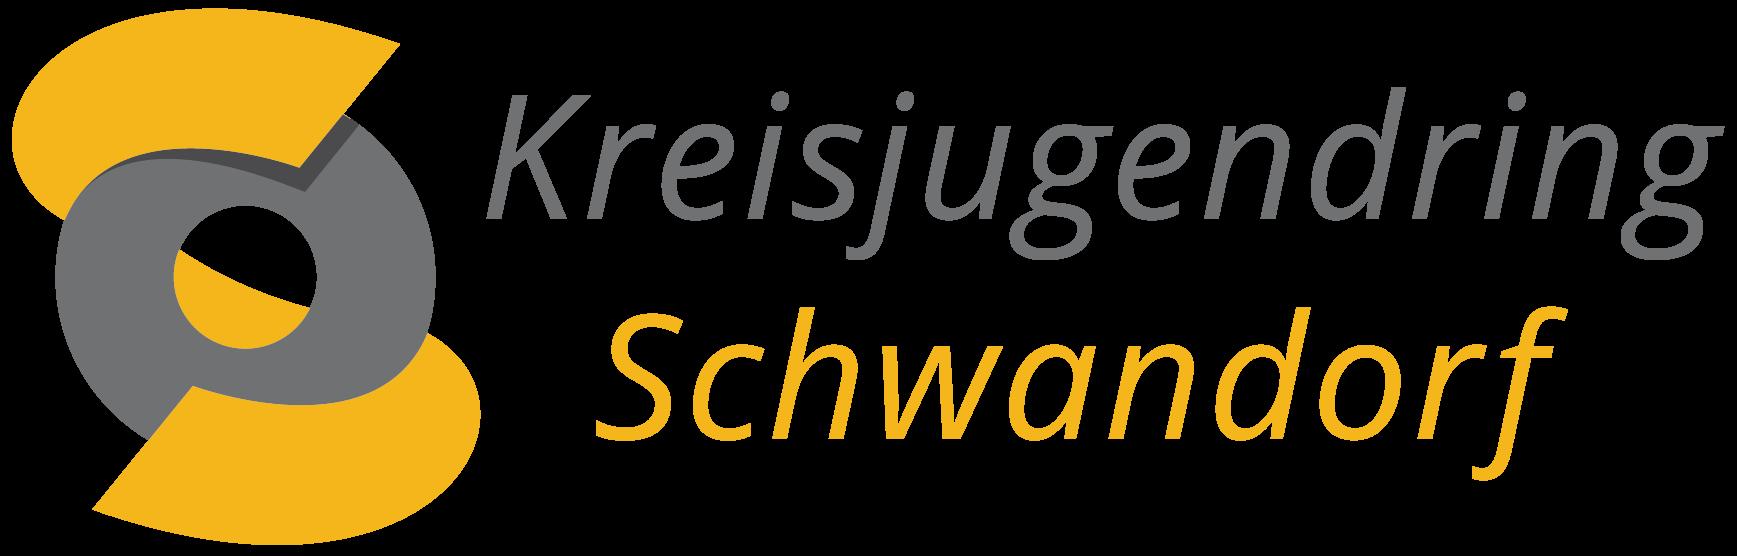 KJR Schwandorf